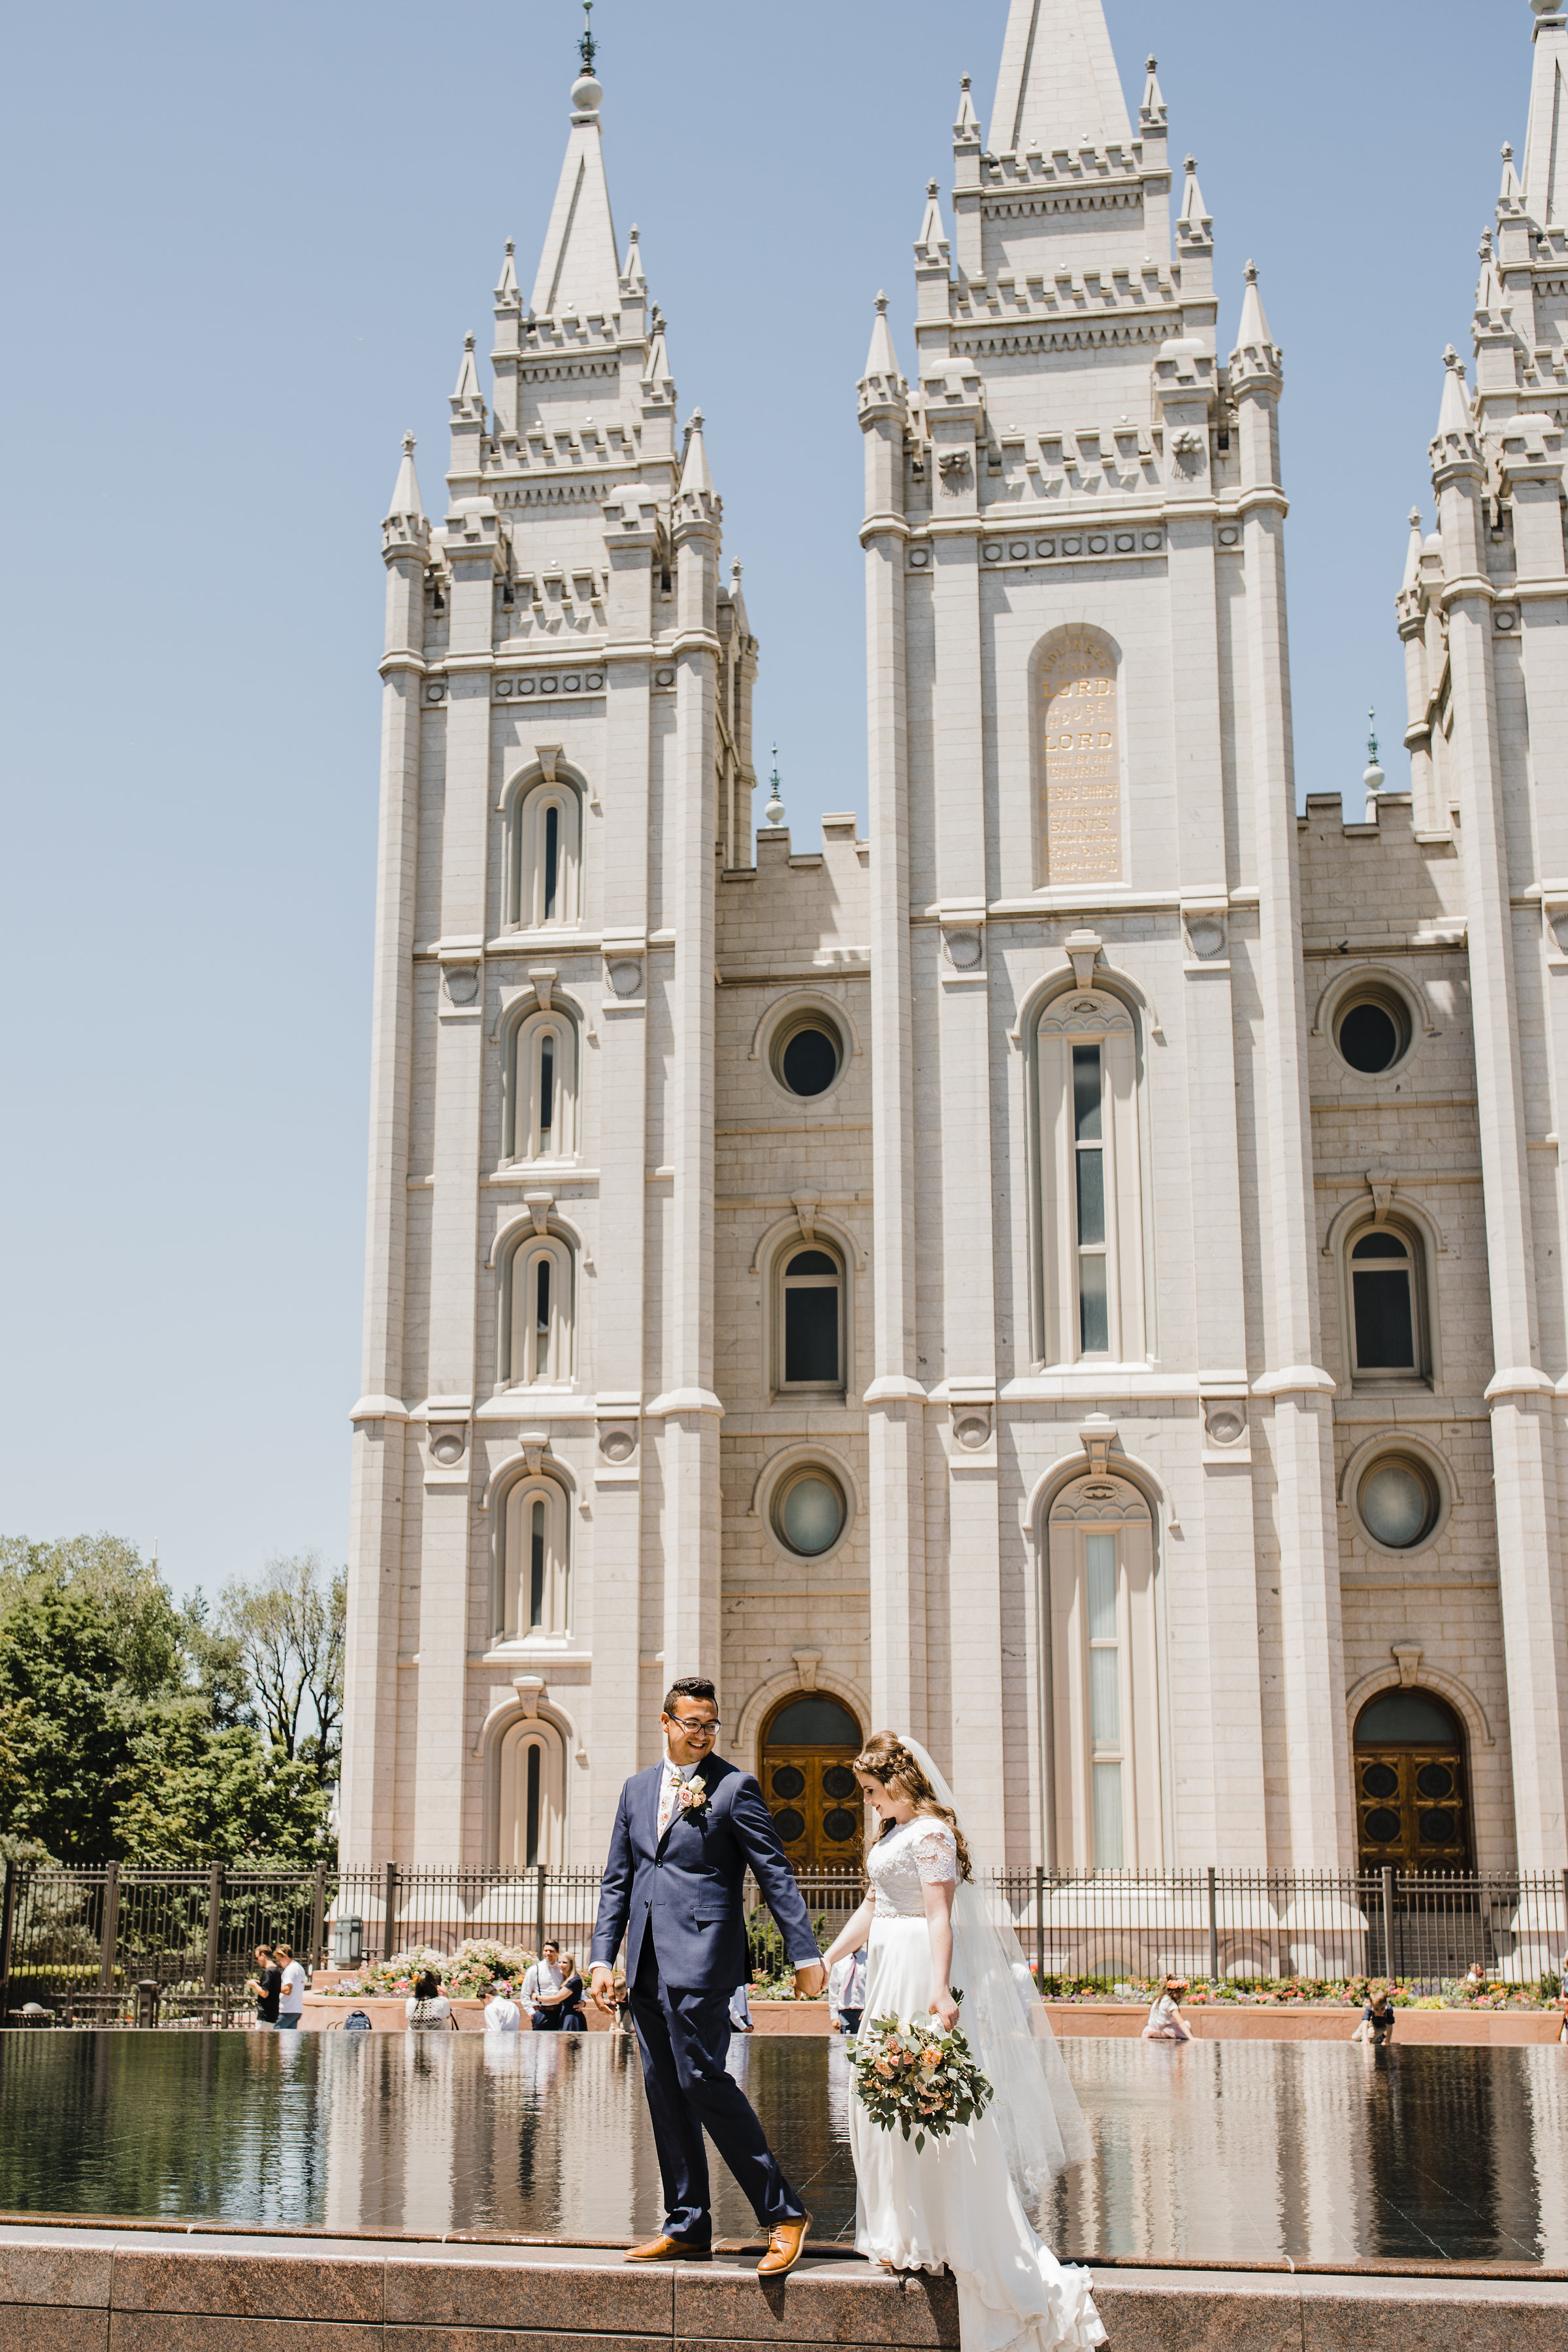 salt lake city wedding photographer walking water lds temple grounds holding hands